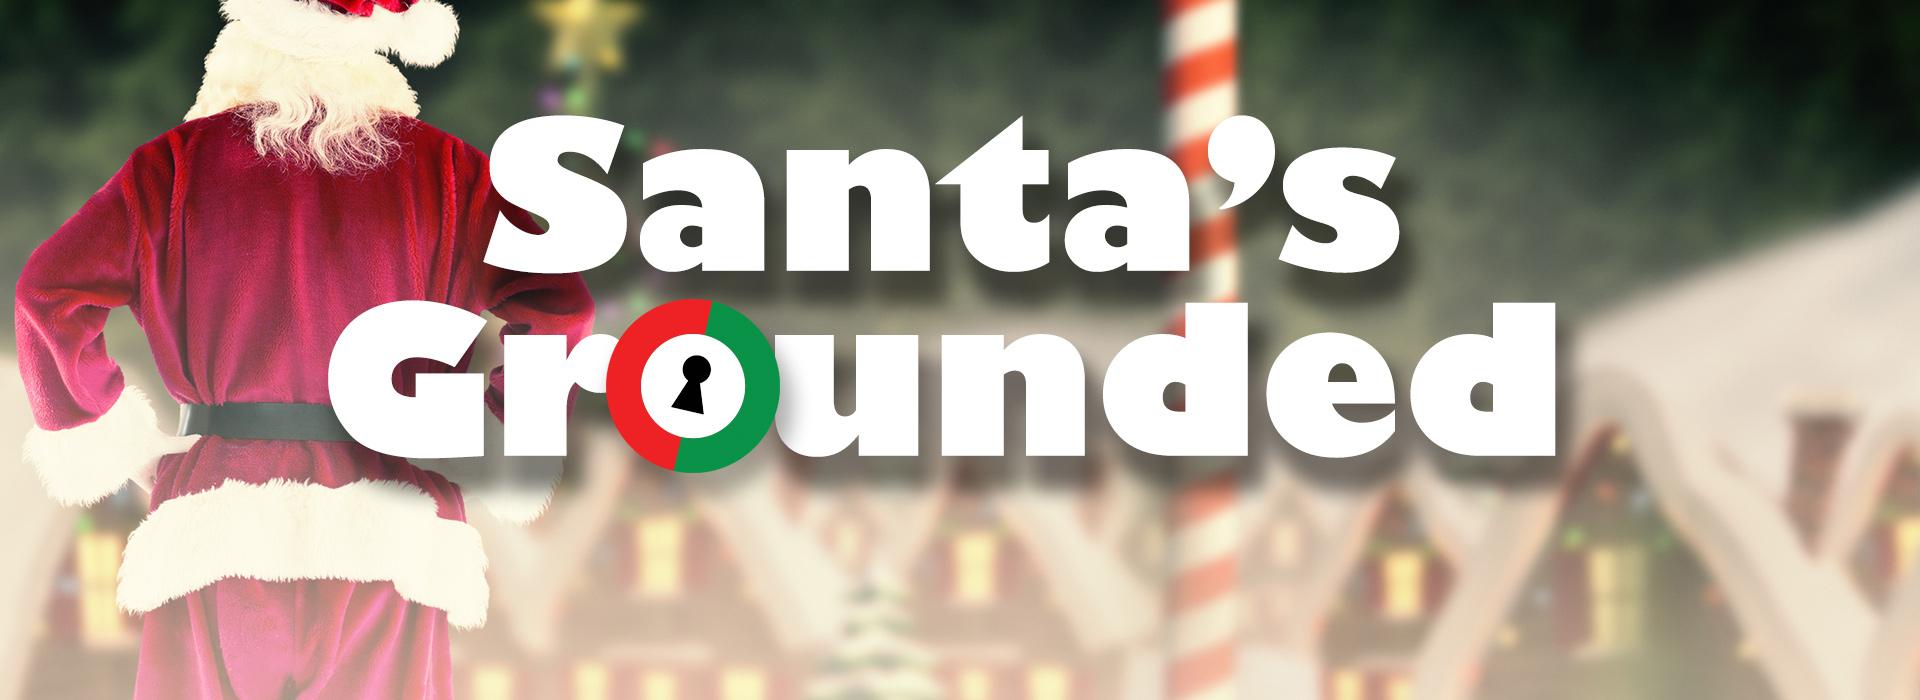 Santa' s Grounded Header Image